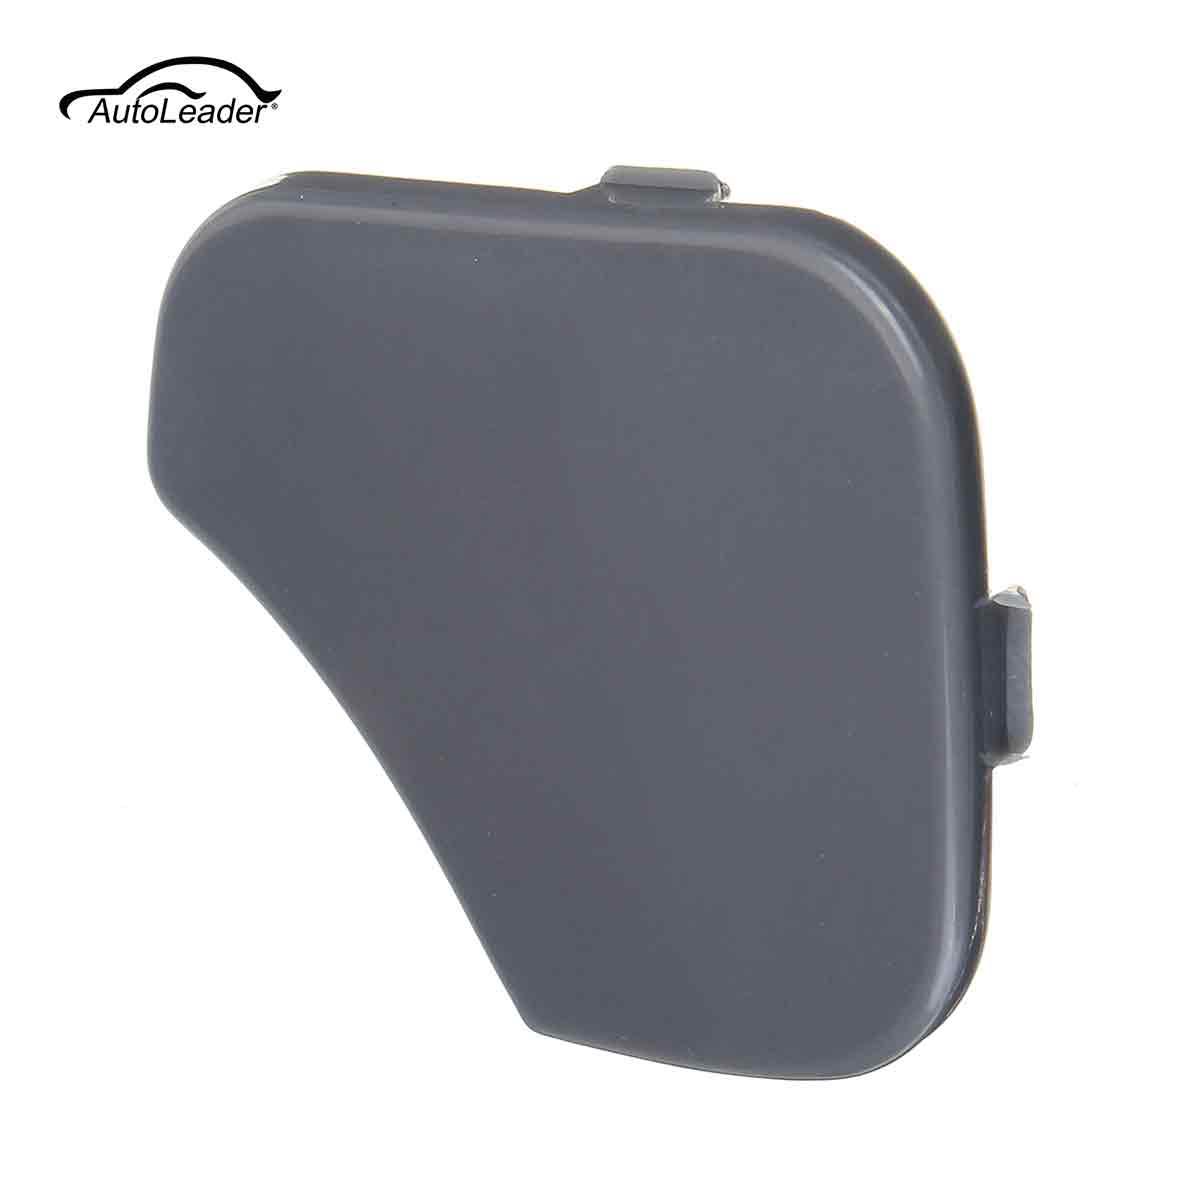 ABS gris parachoques delantero Tow gancho tapa de la cubierta para FORD para FIESTA MK6 2005 2006 2007 2008 8x6x1,5 cm 1375861 6S6117A989AA 1 pieza